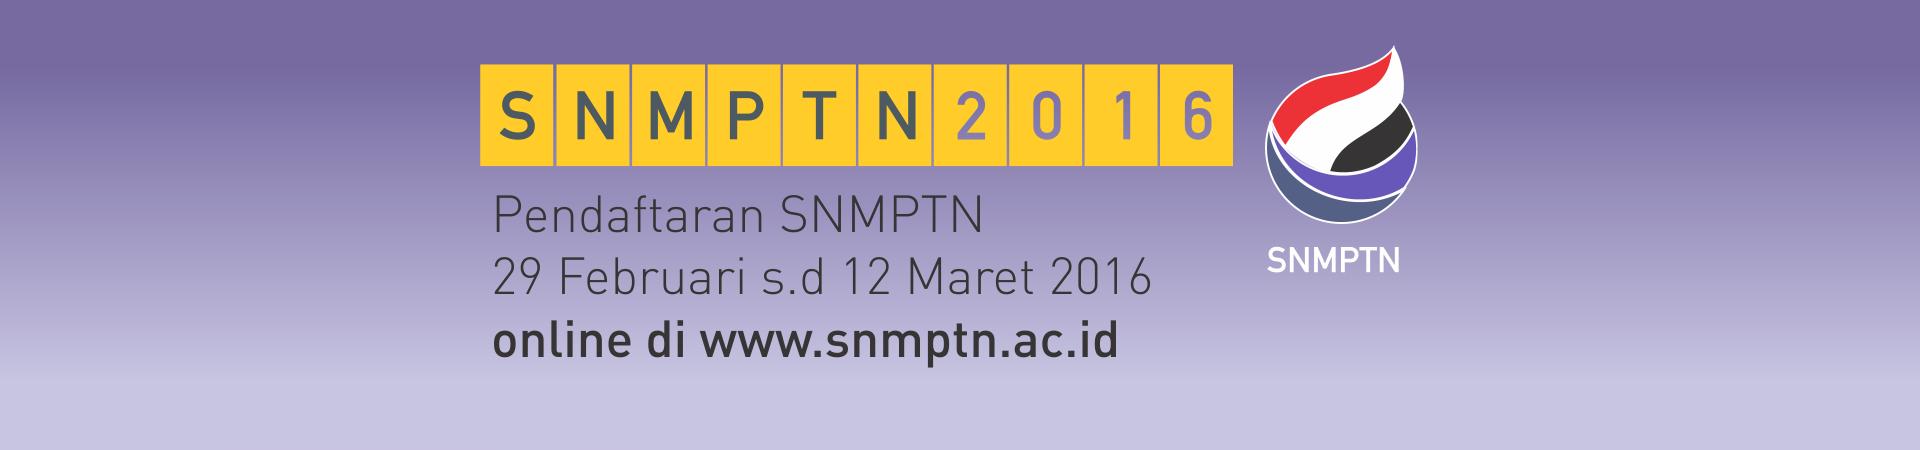 SNMPTN-WEB-banner